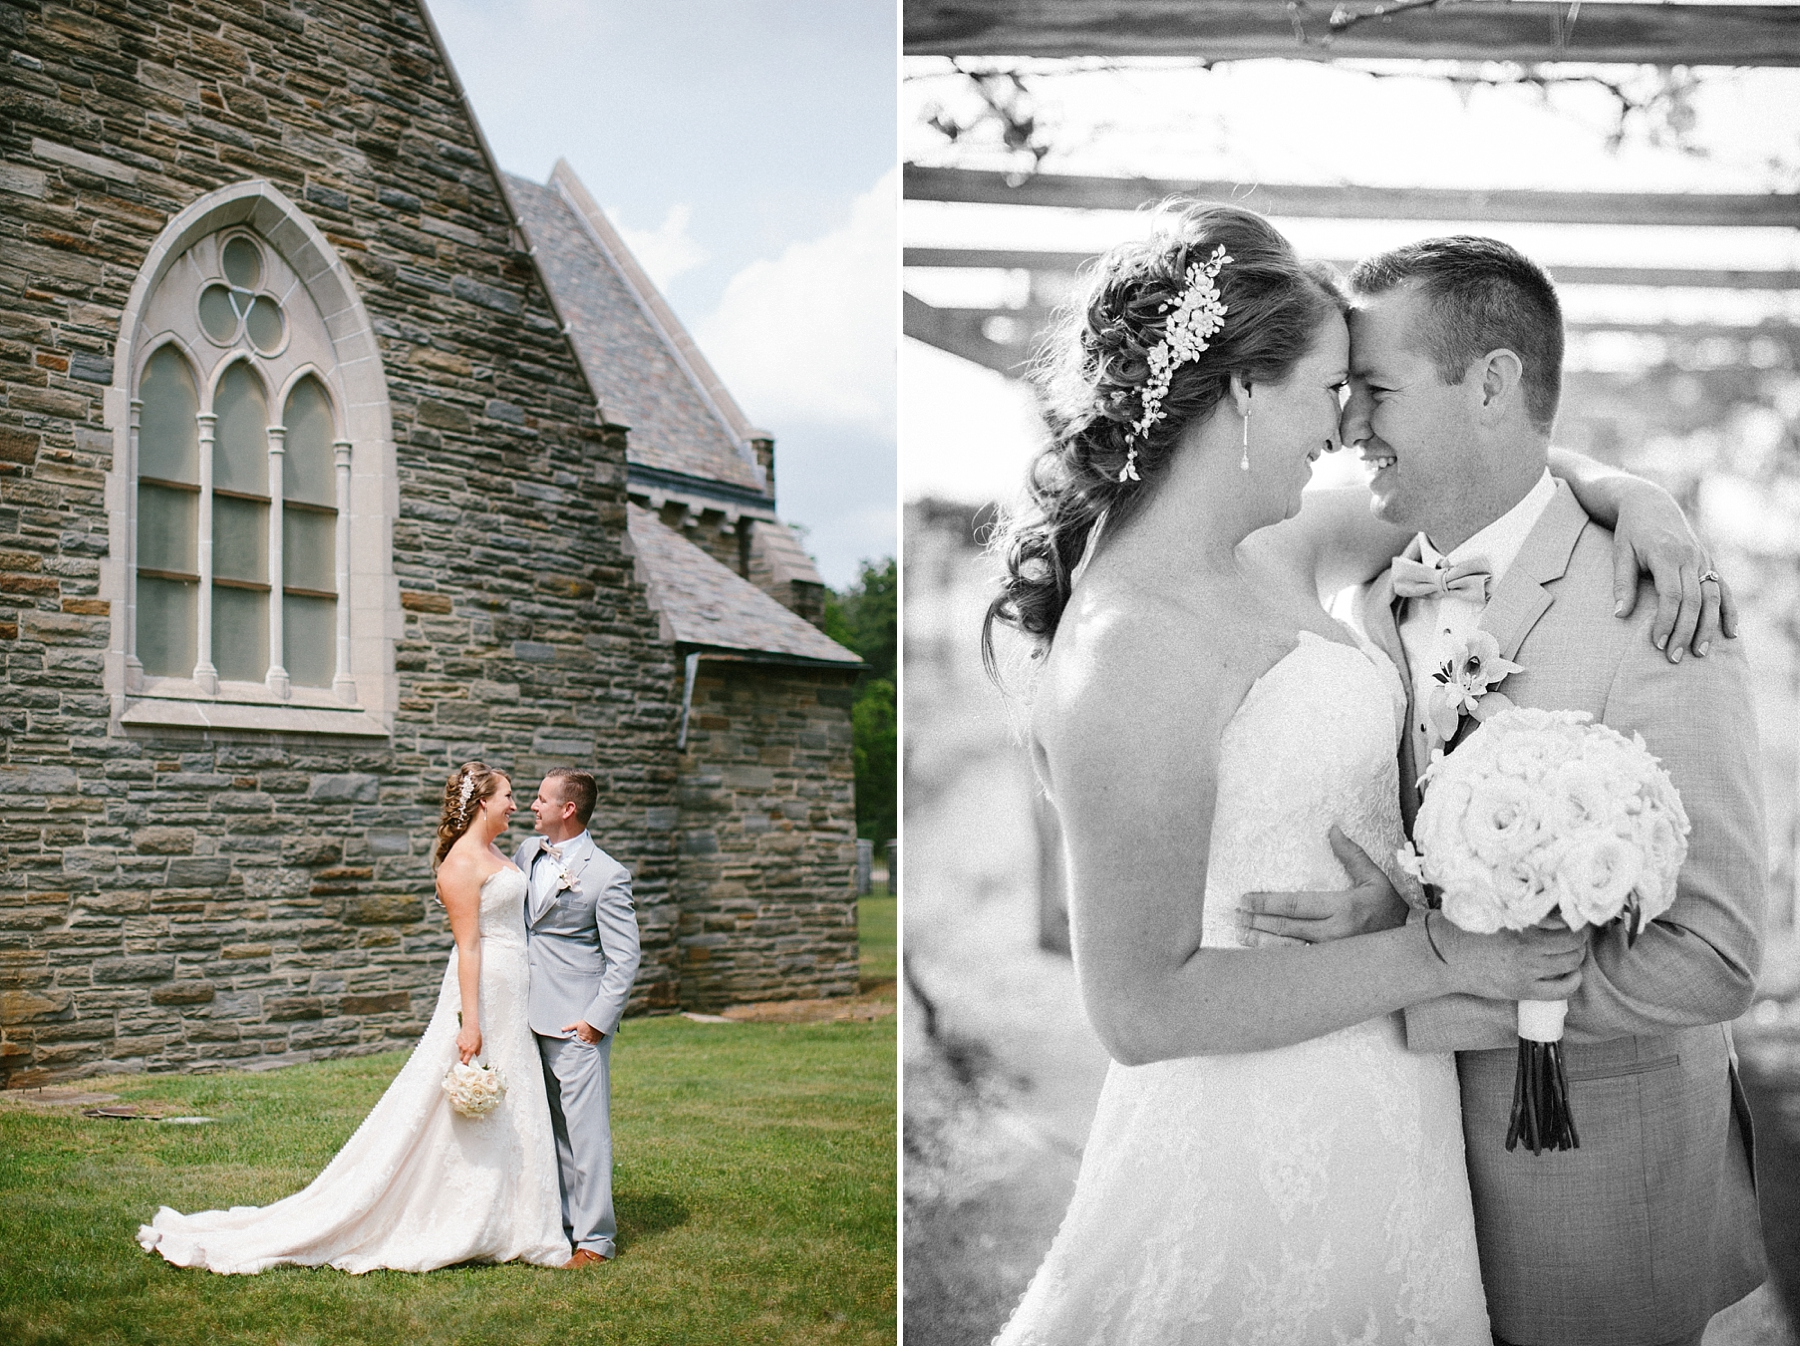 farm-wedding-engagement-session-destination-intimate_0033.jpg